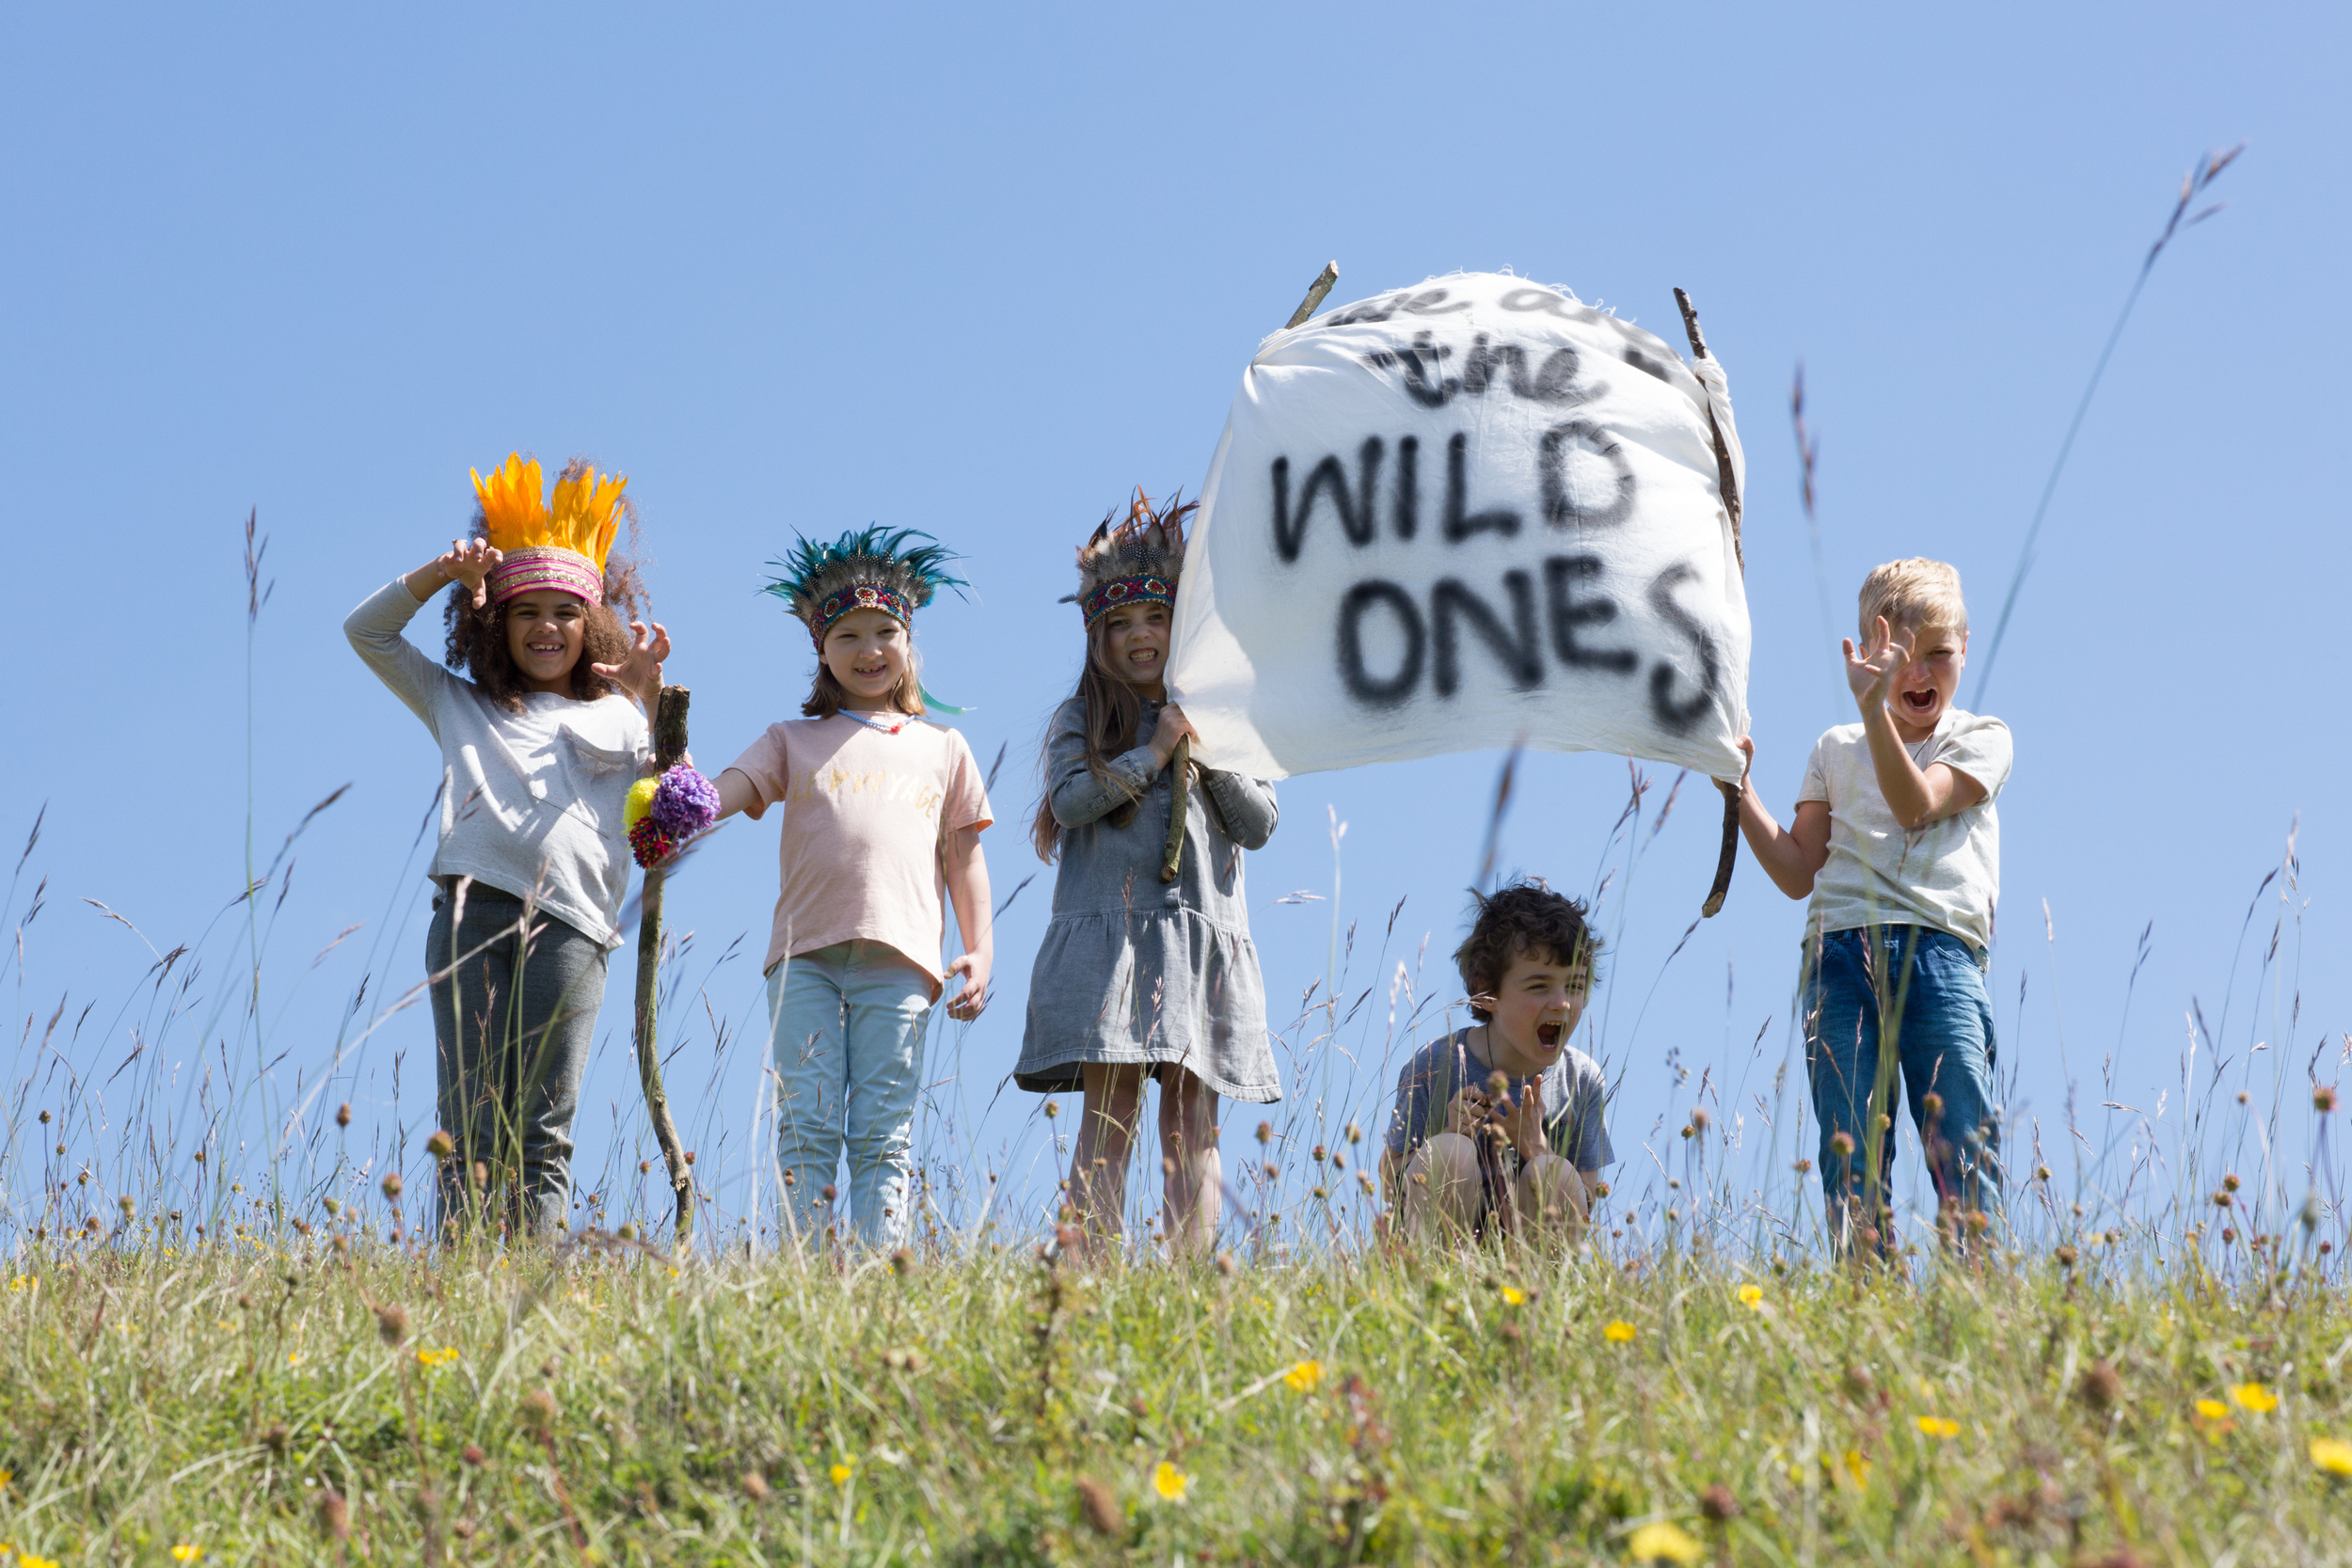 We are the wild ones!